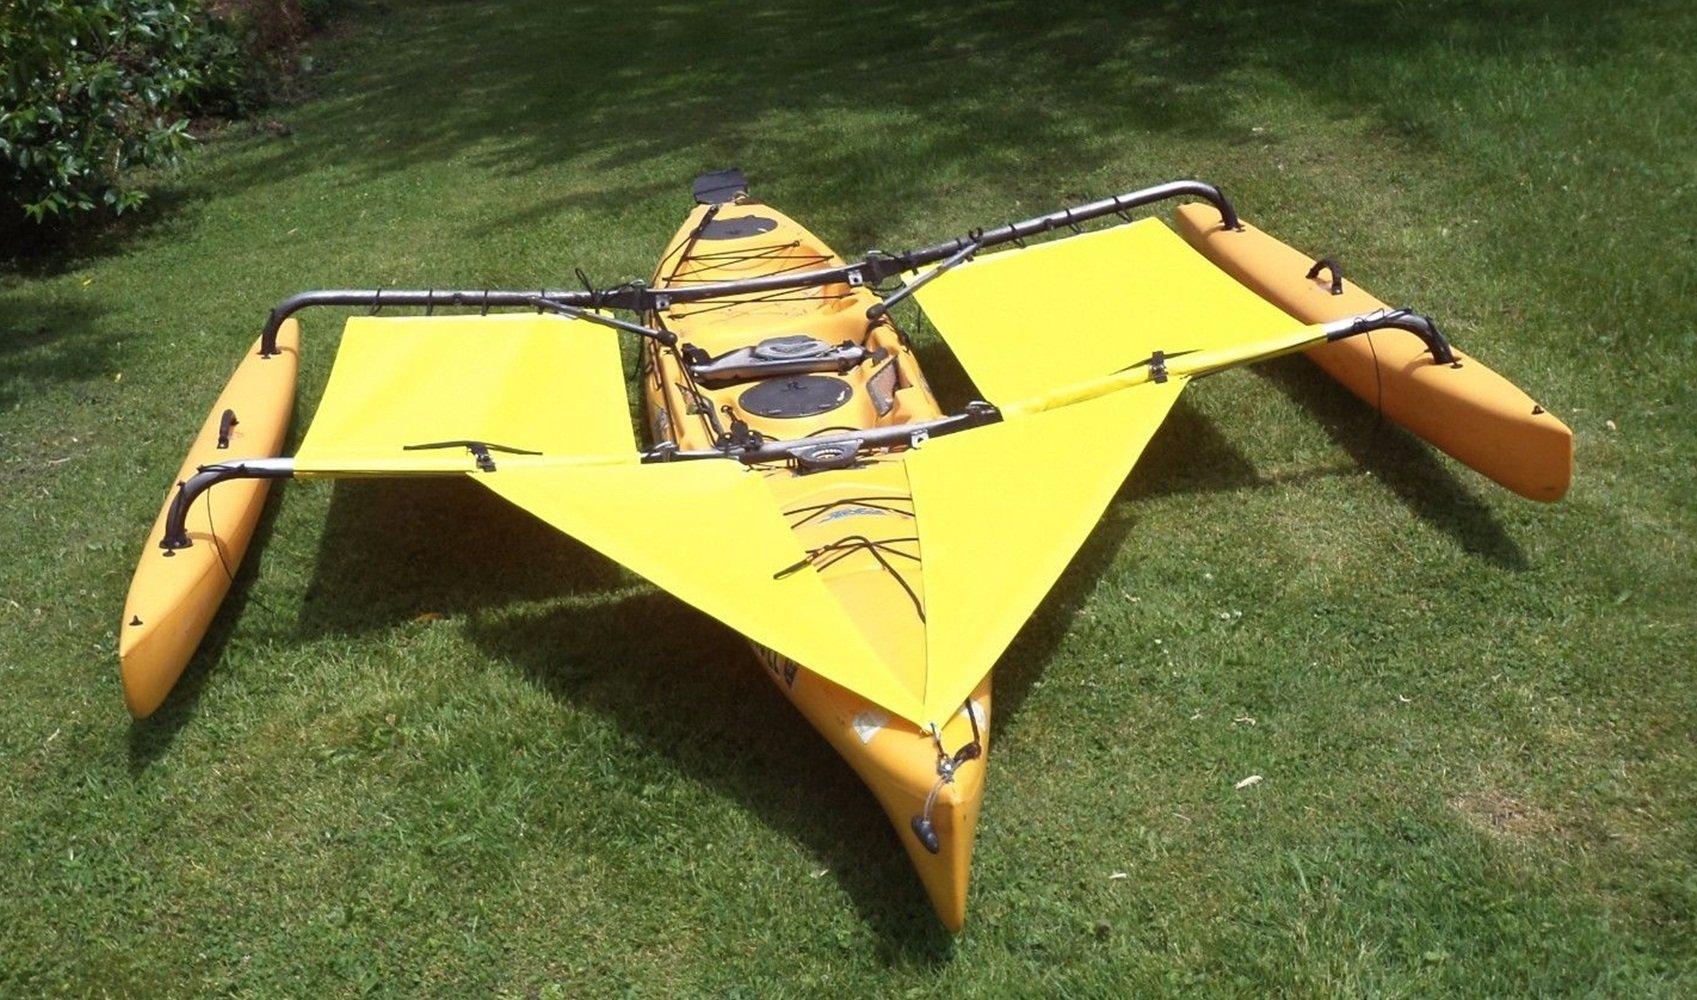 Hobie Kayak Trampoline yellow Adventure Tandem & splash shield set